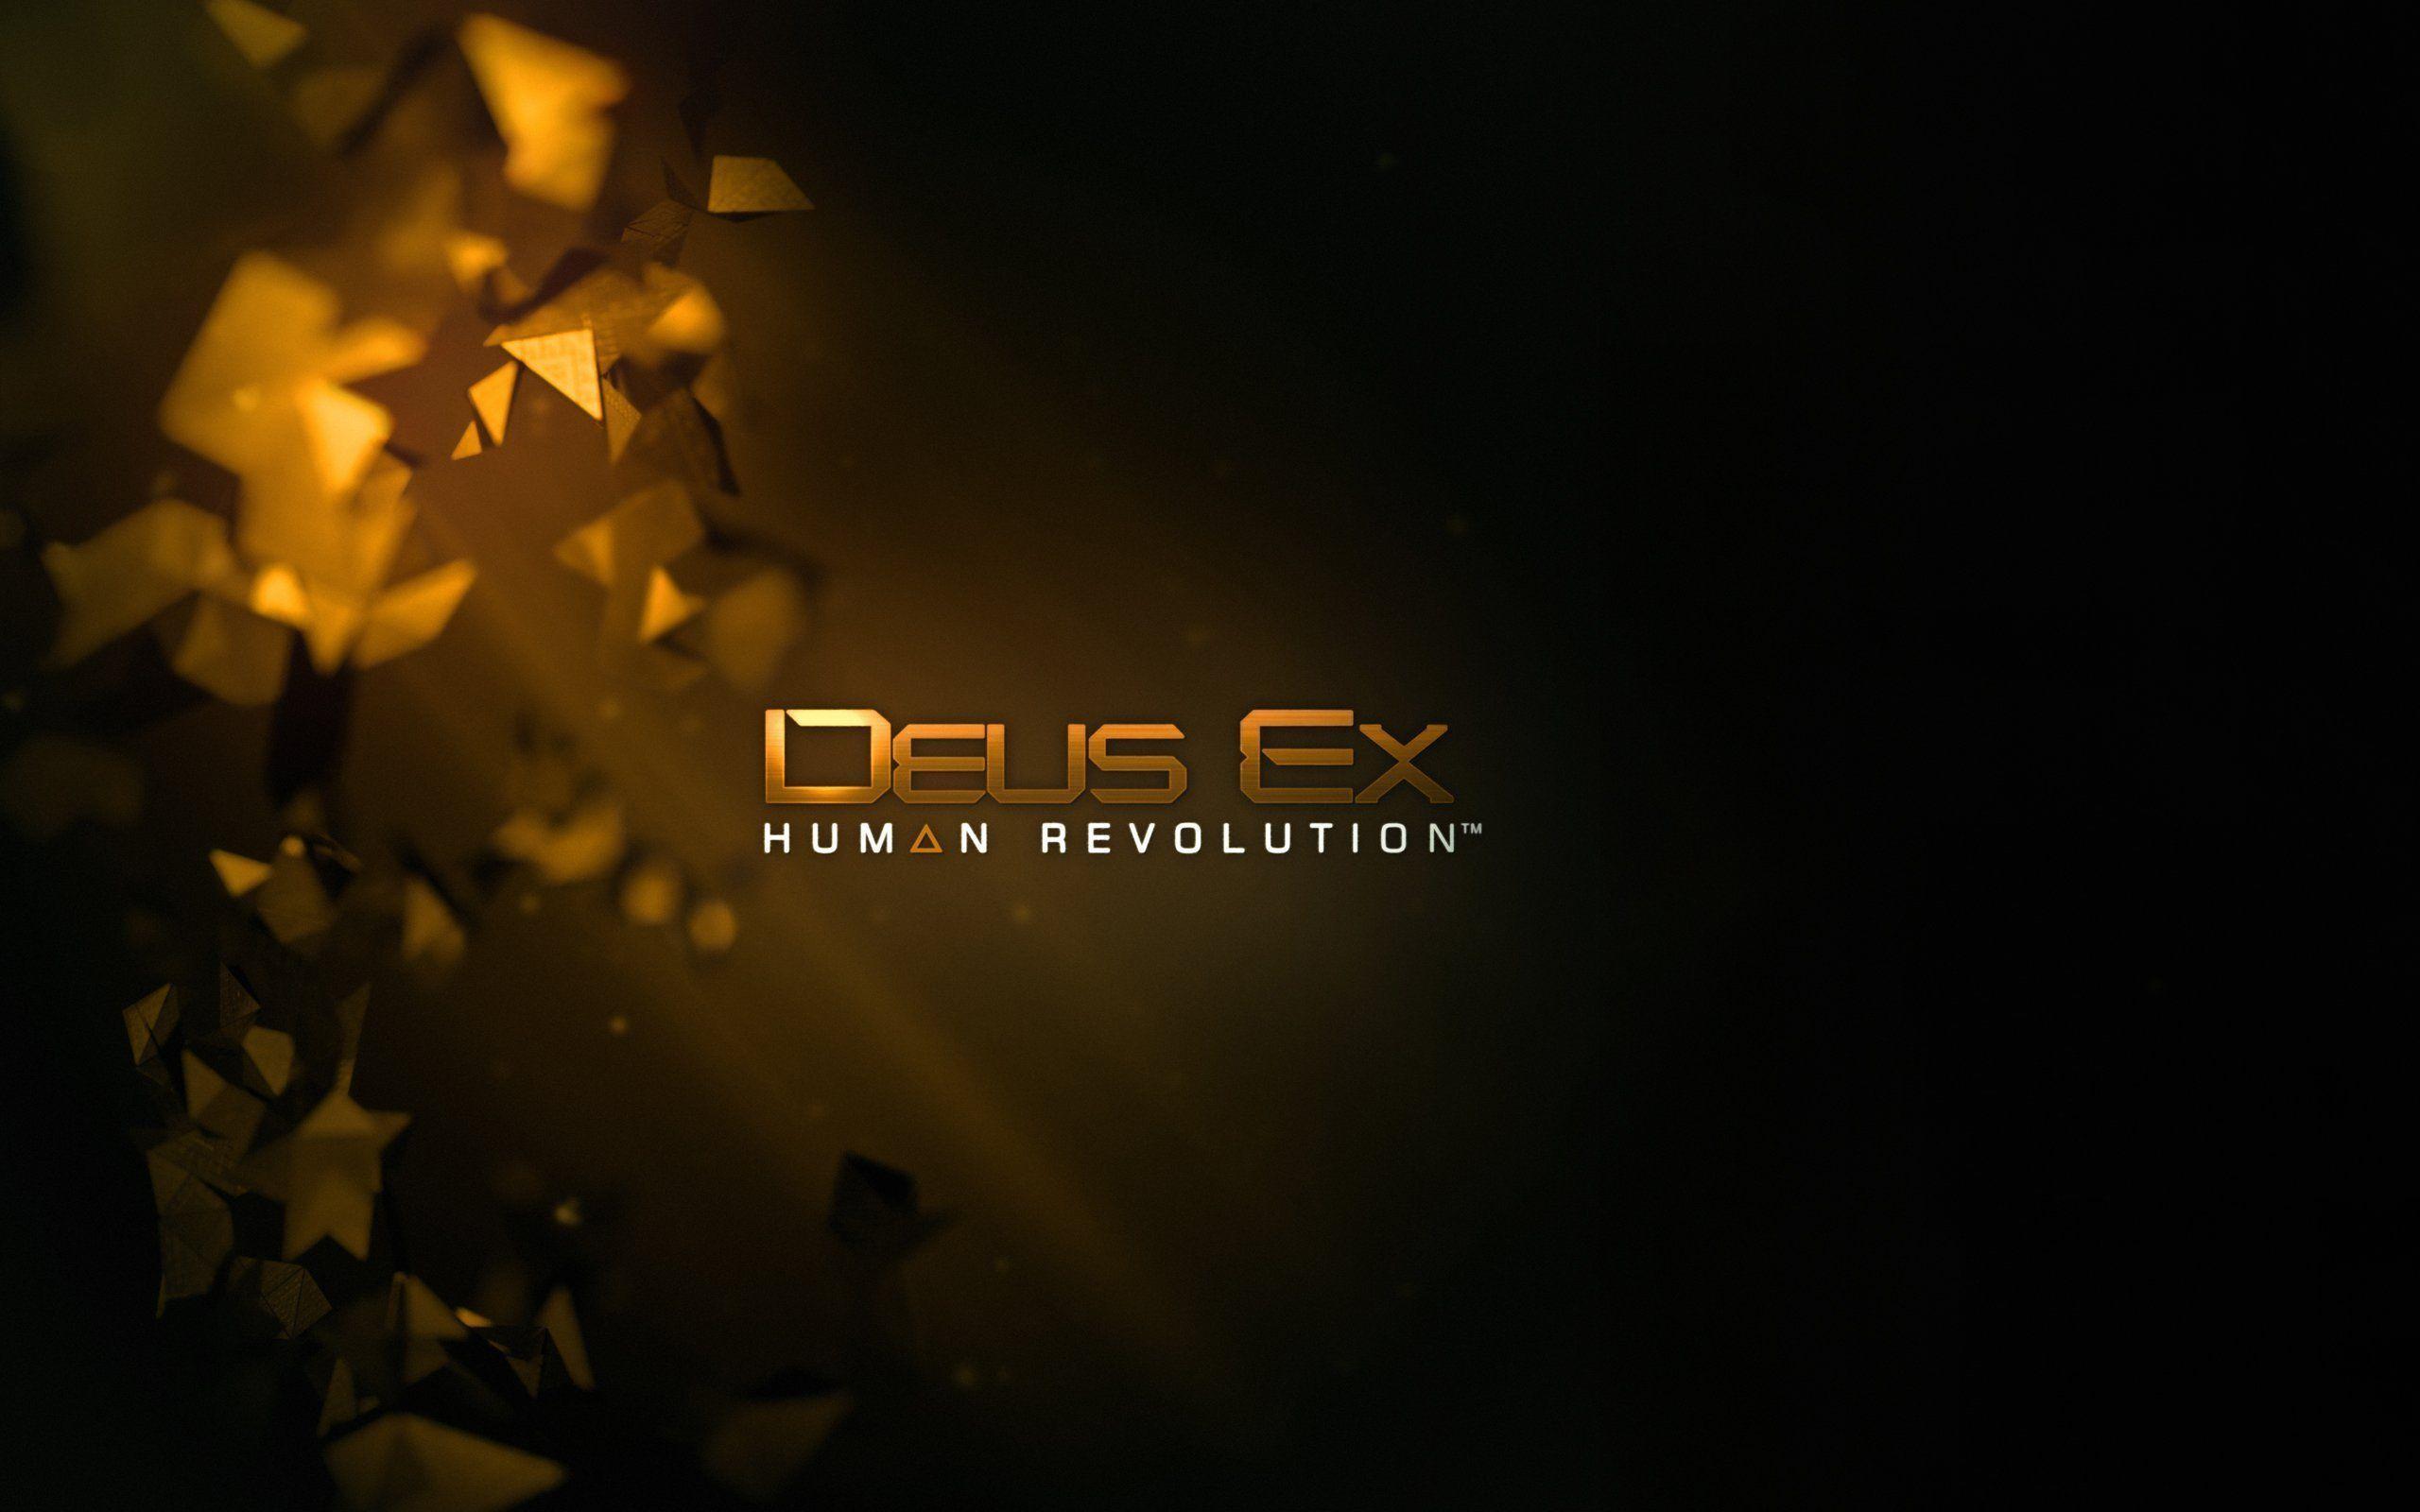 Deus ex wallpapers hd voltagebd Choice Image